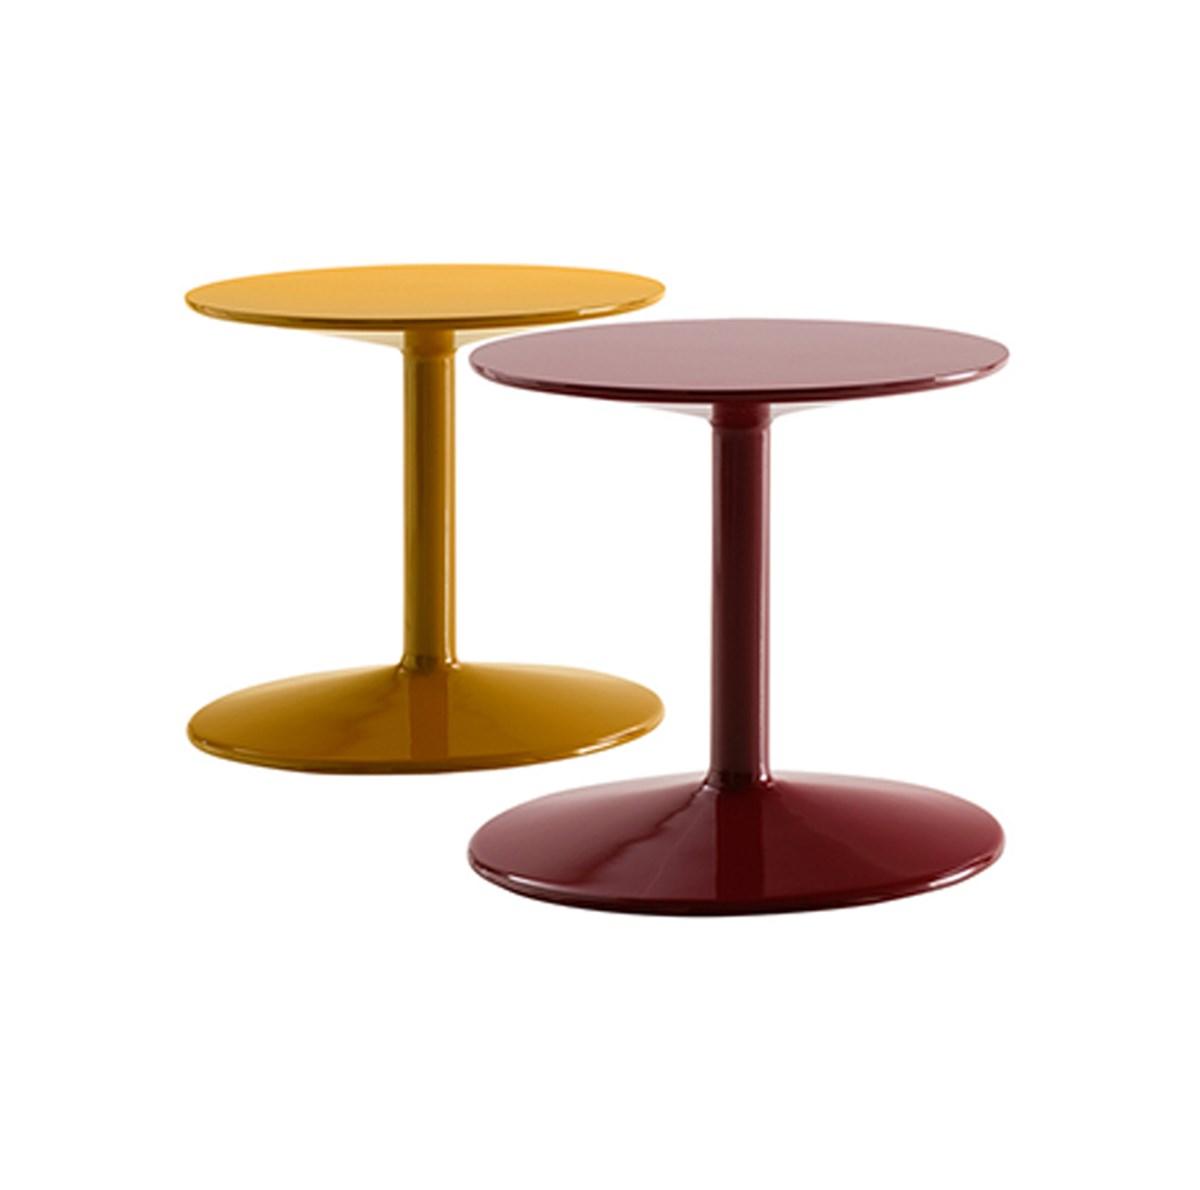 B&B-Italia-Piero-Lissoni-Spool-Table-Matisse-1